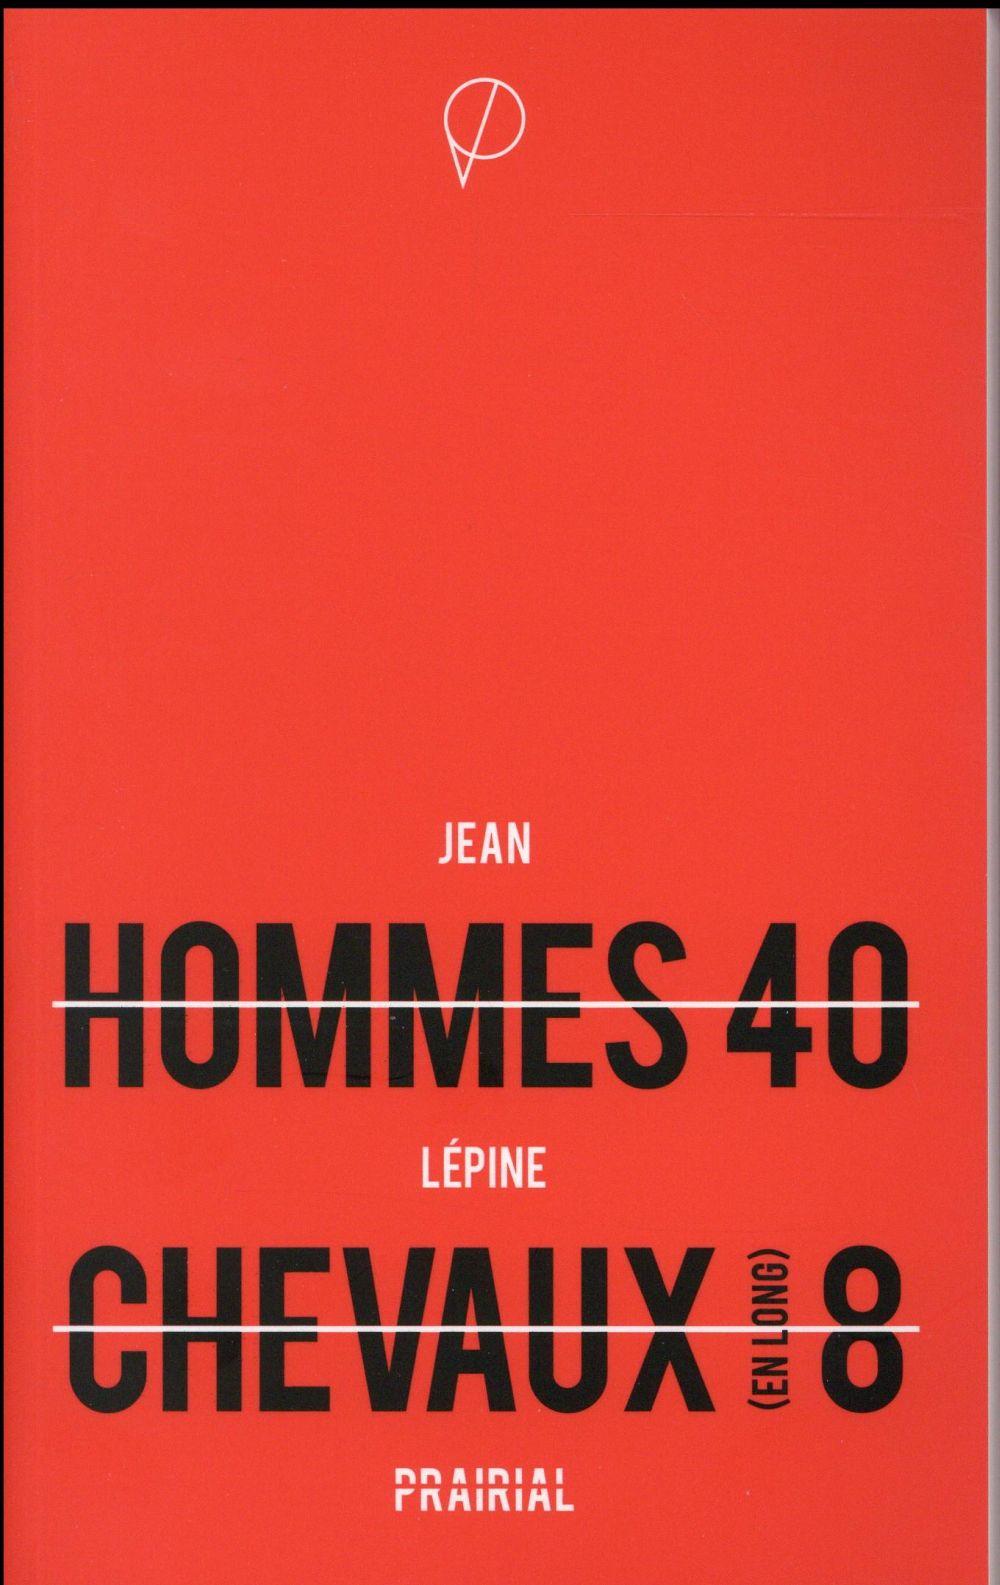 HOMMES 40 CHEVAUX (EN LONG) 8